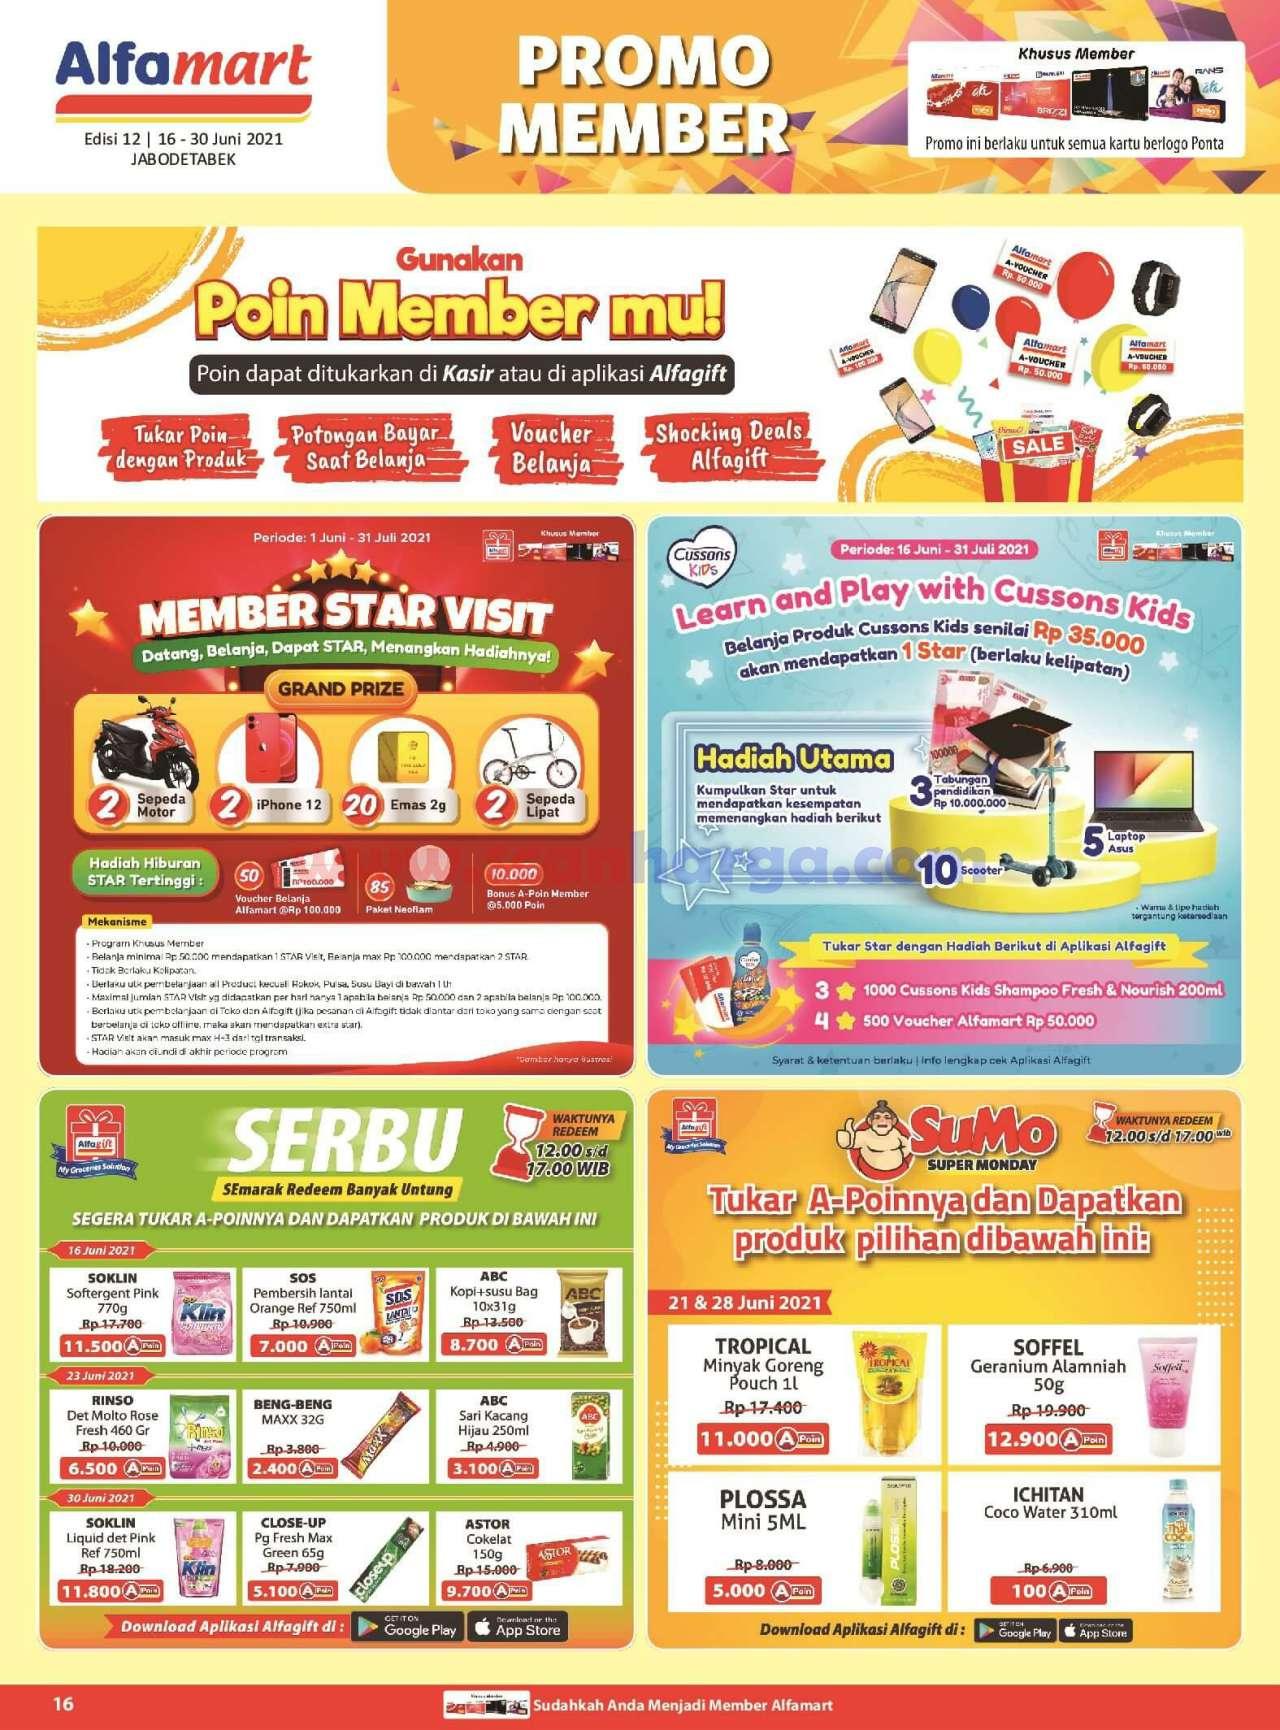 Katalog Promo Alfamart 16 - 30 Juni 2021 16